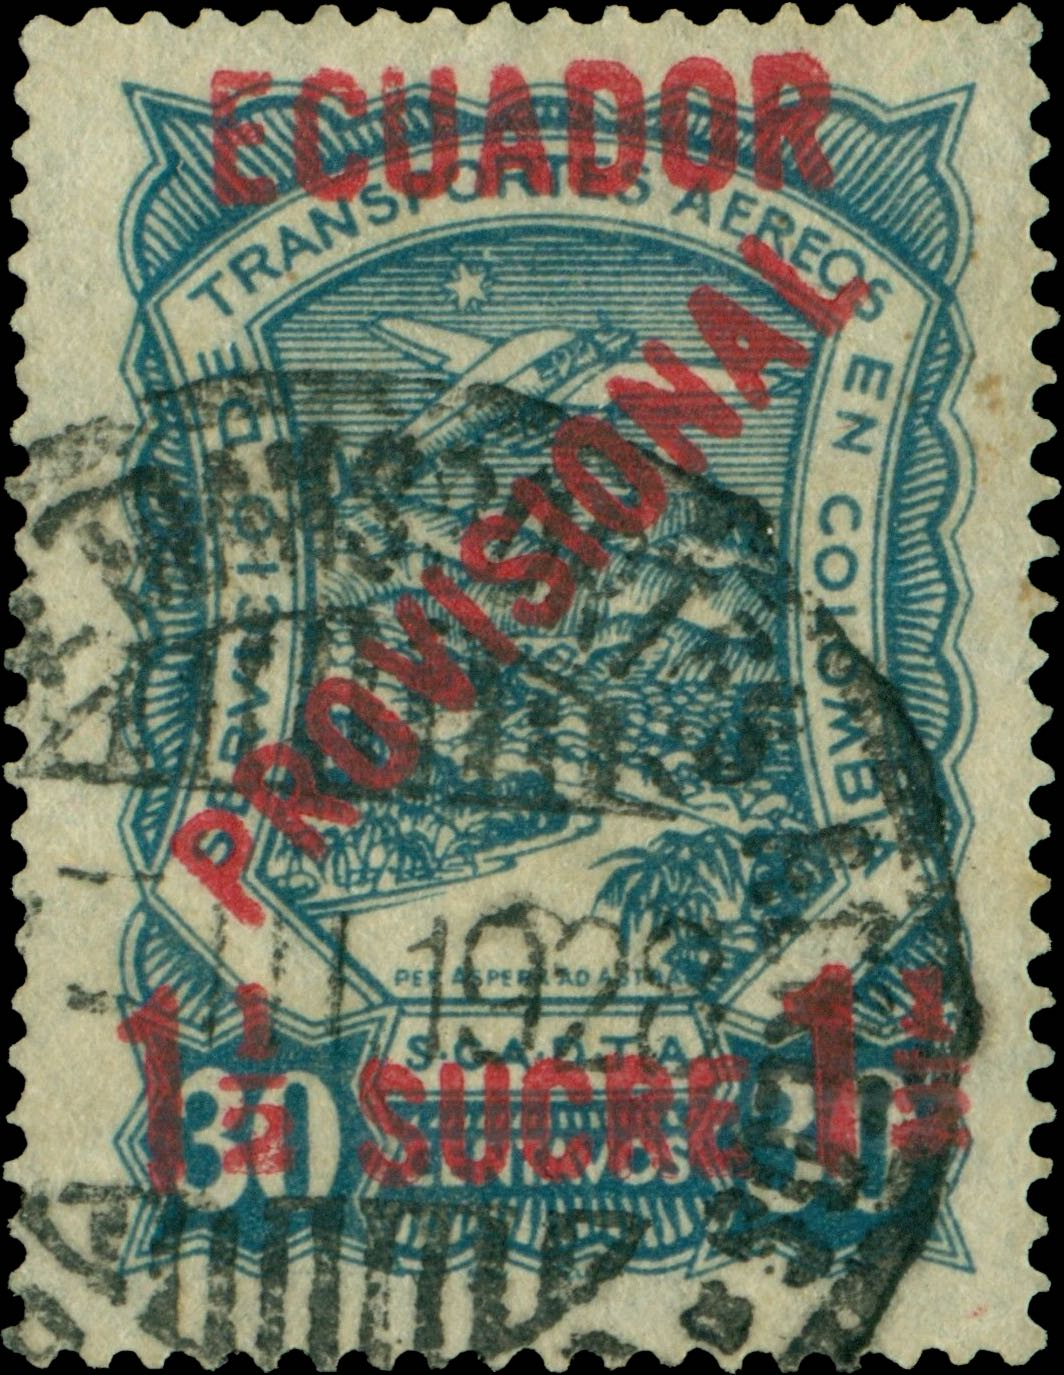 Ecuador_1928_Airmail_1.5on30c_Forgery